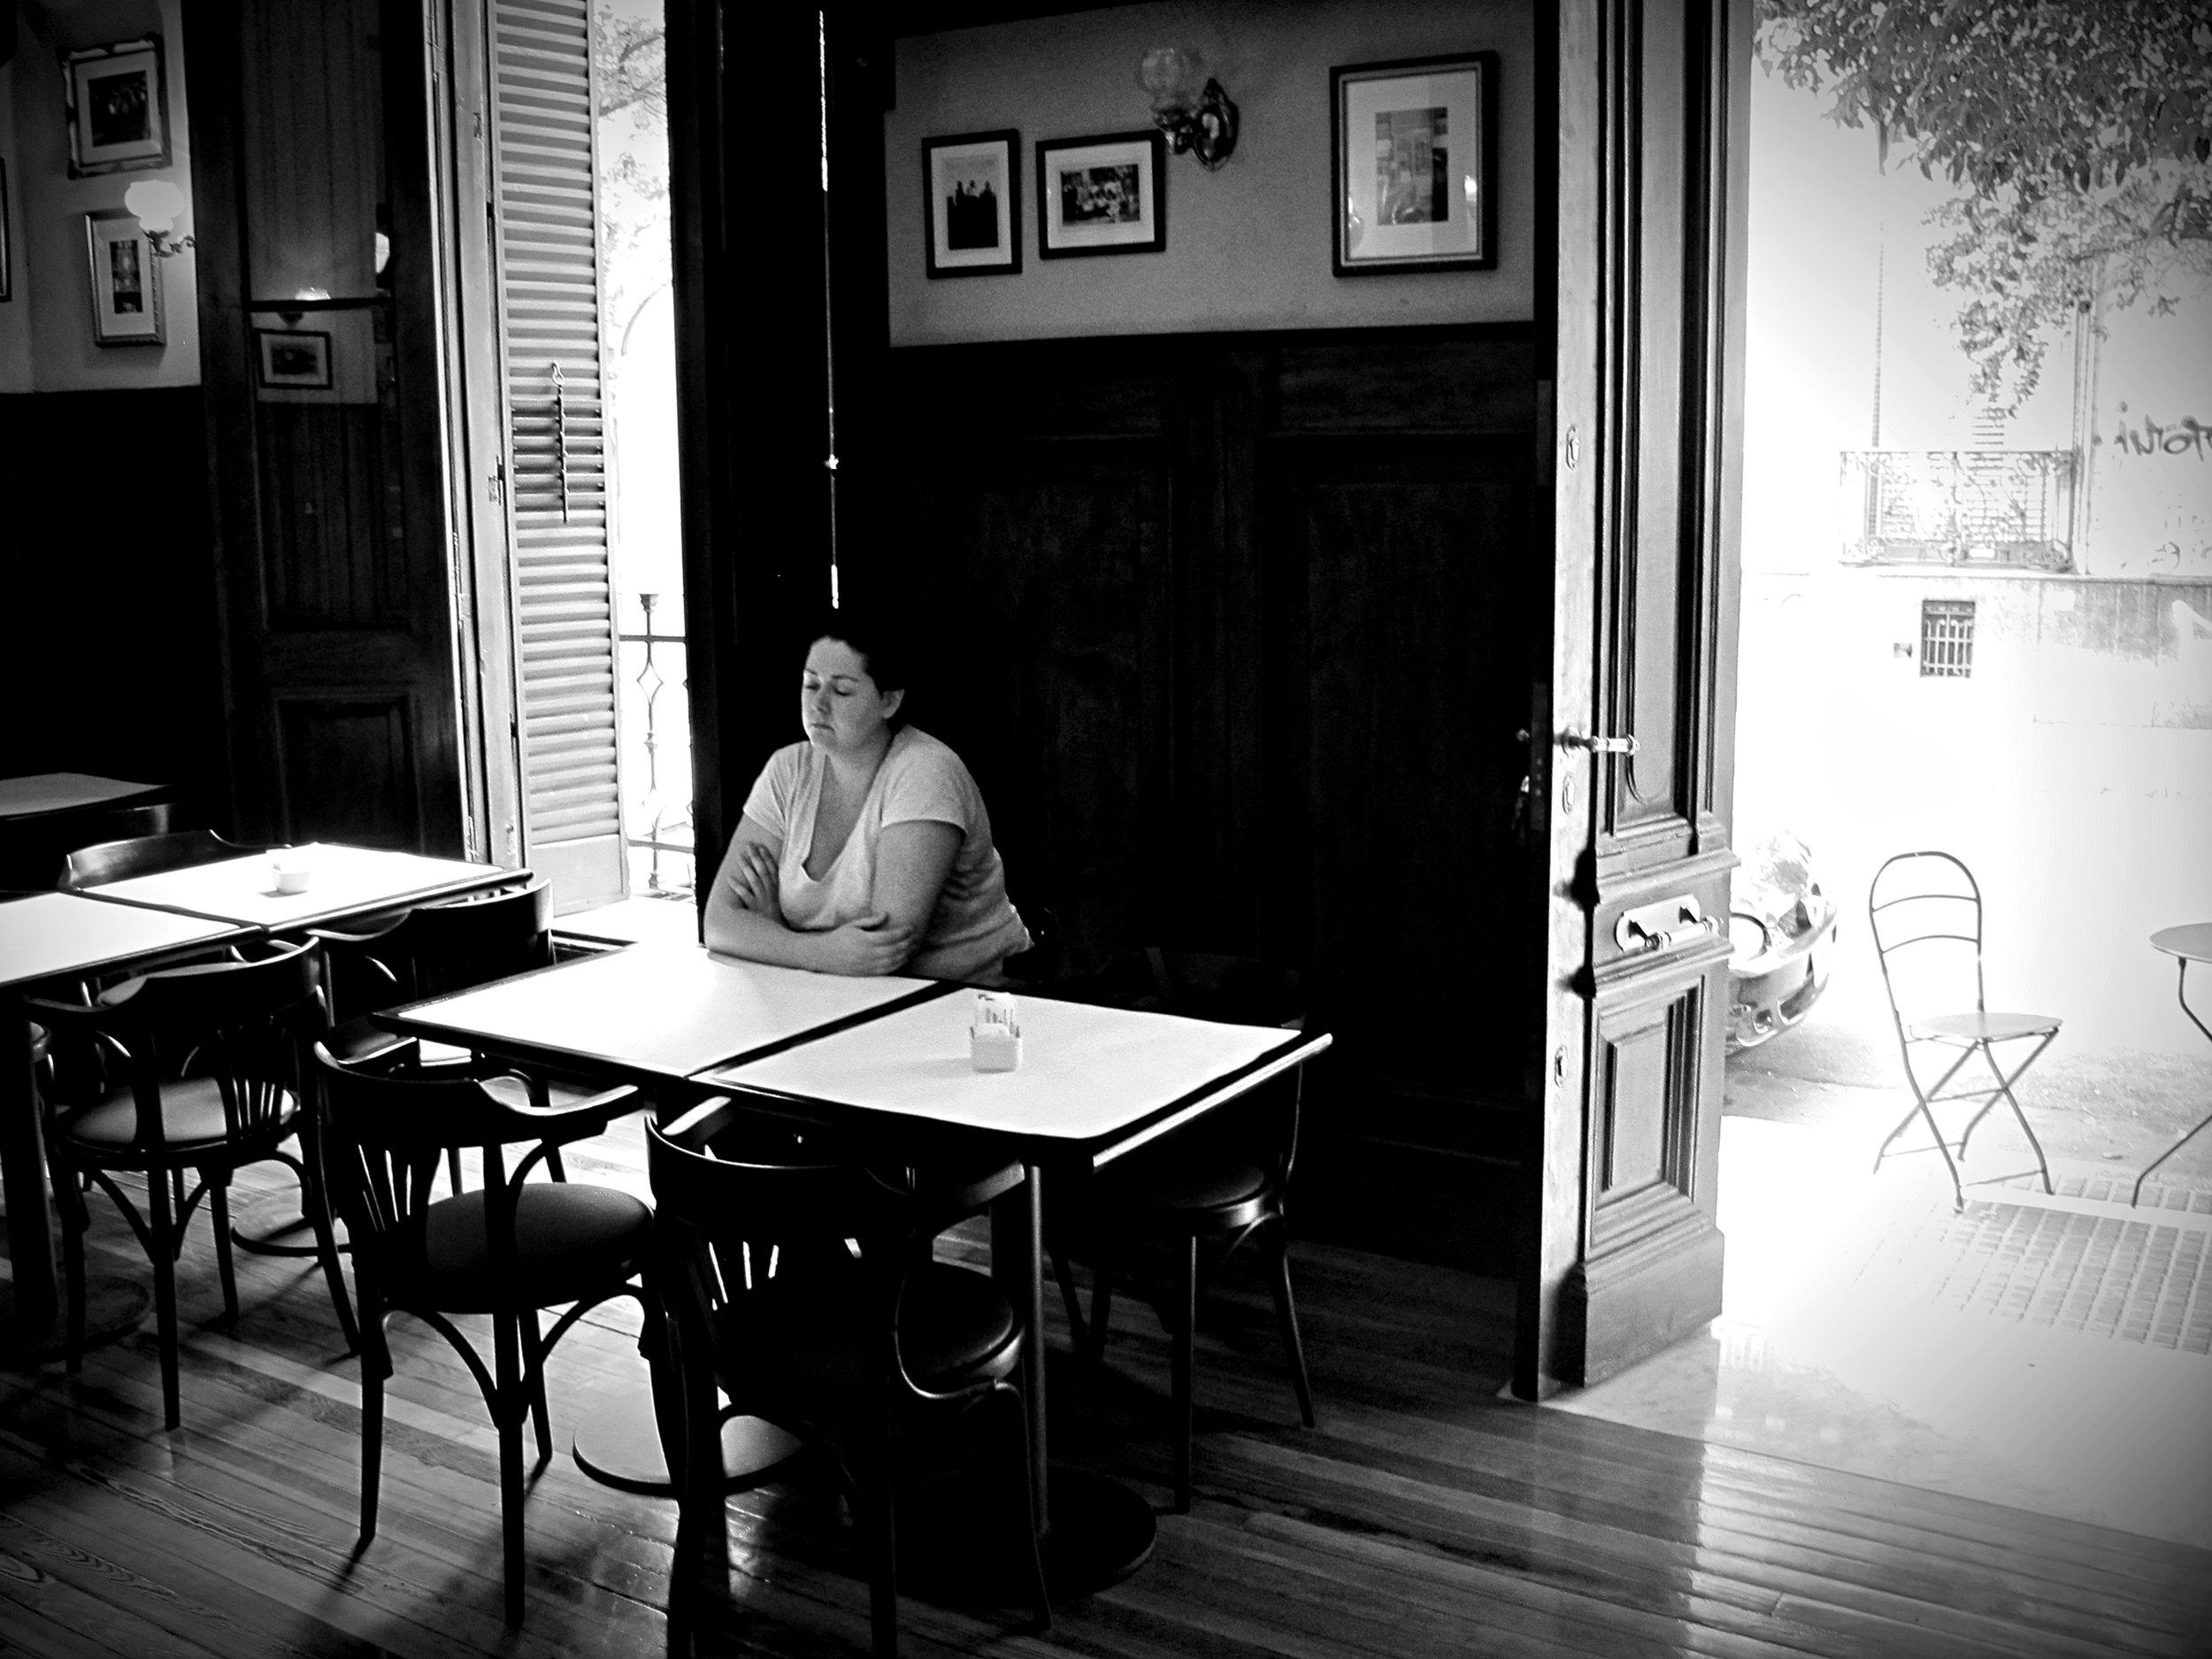 cafewoman.jpg